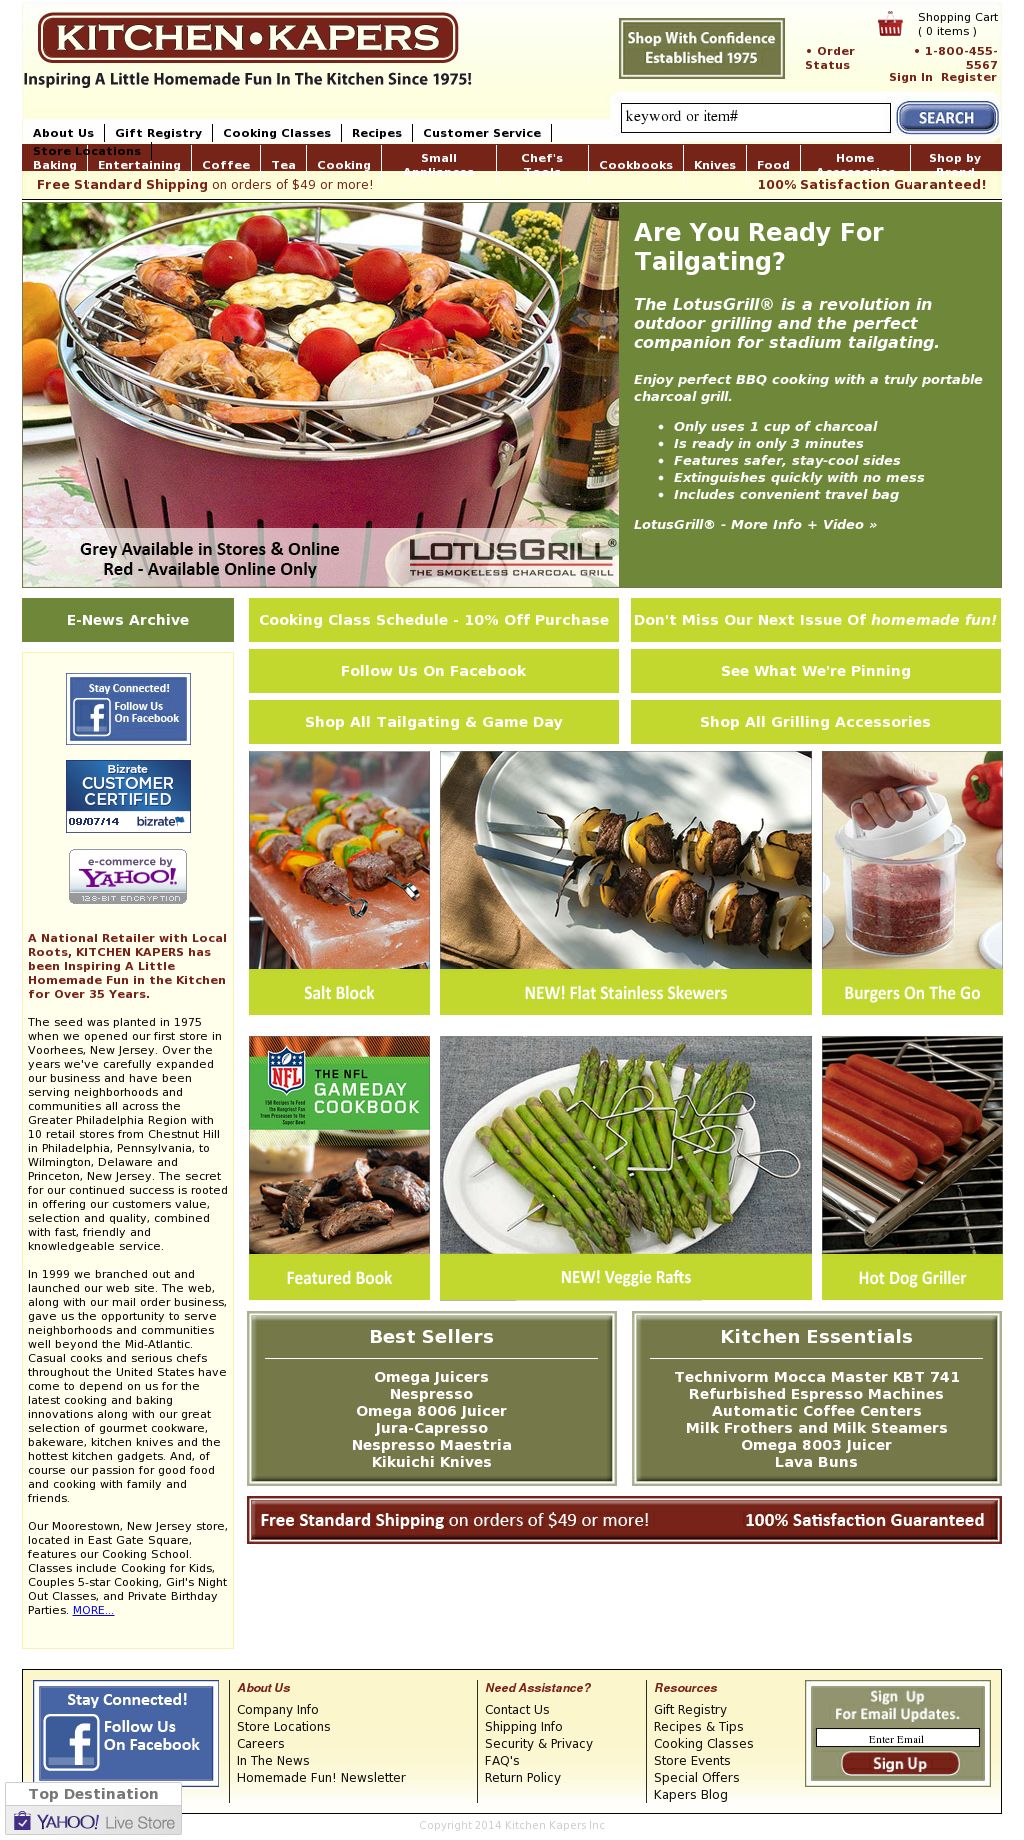 Kitchen Kapers Website History